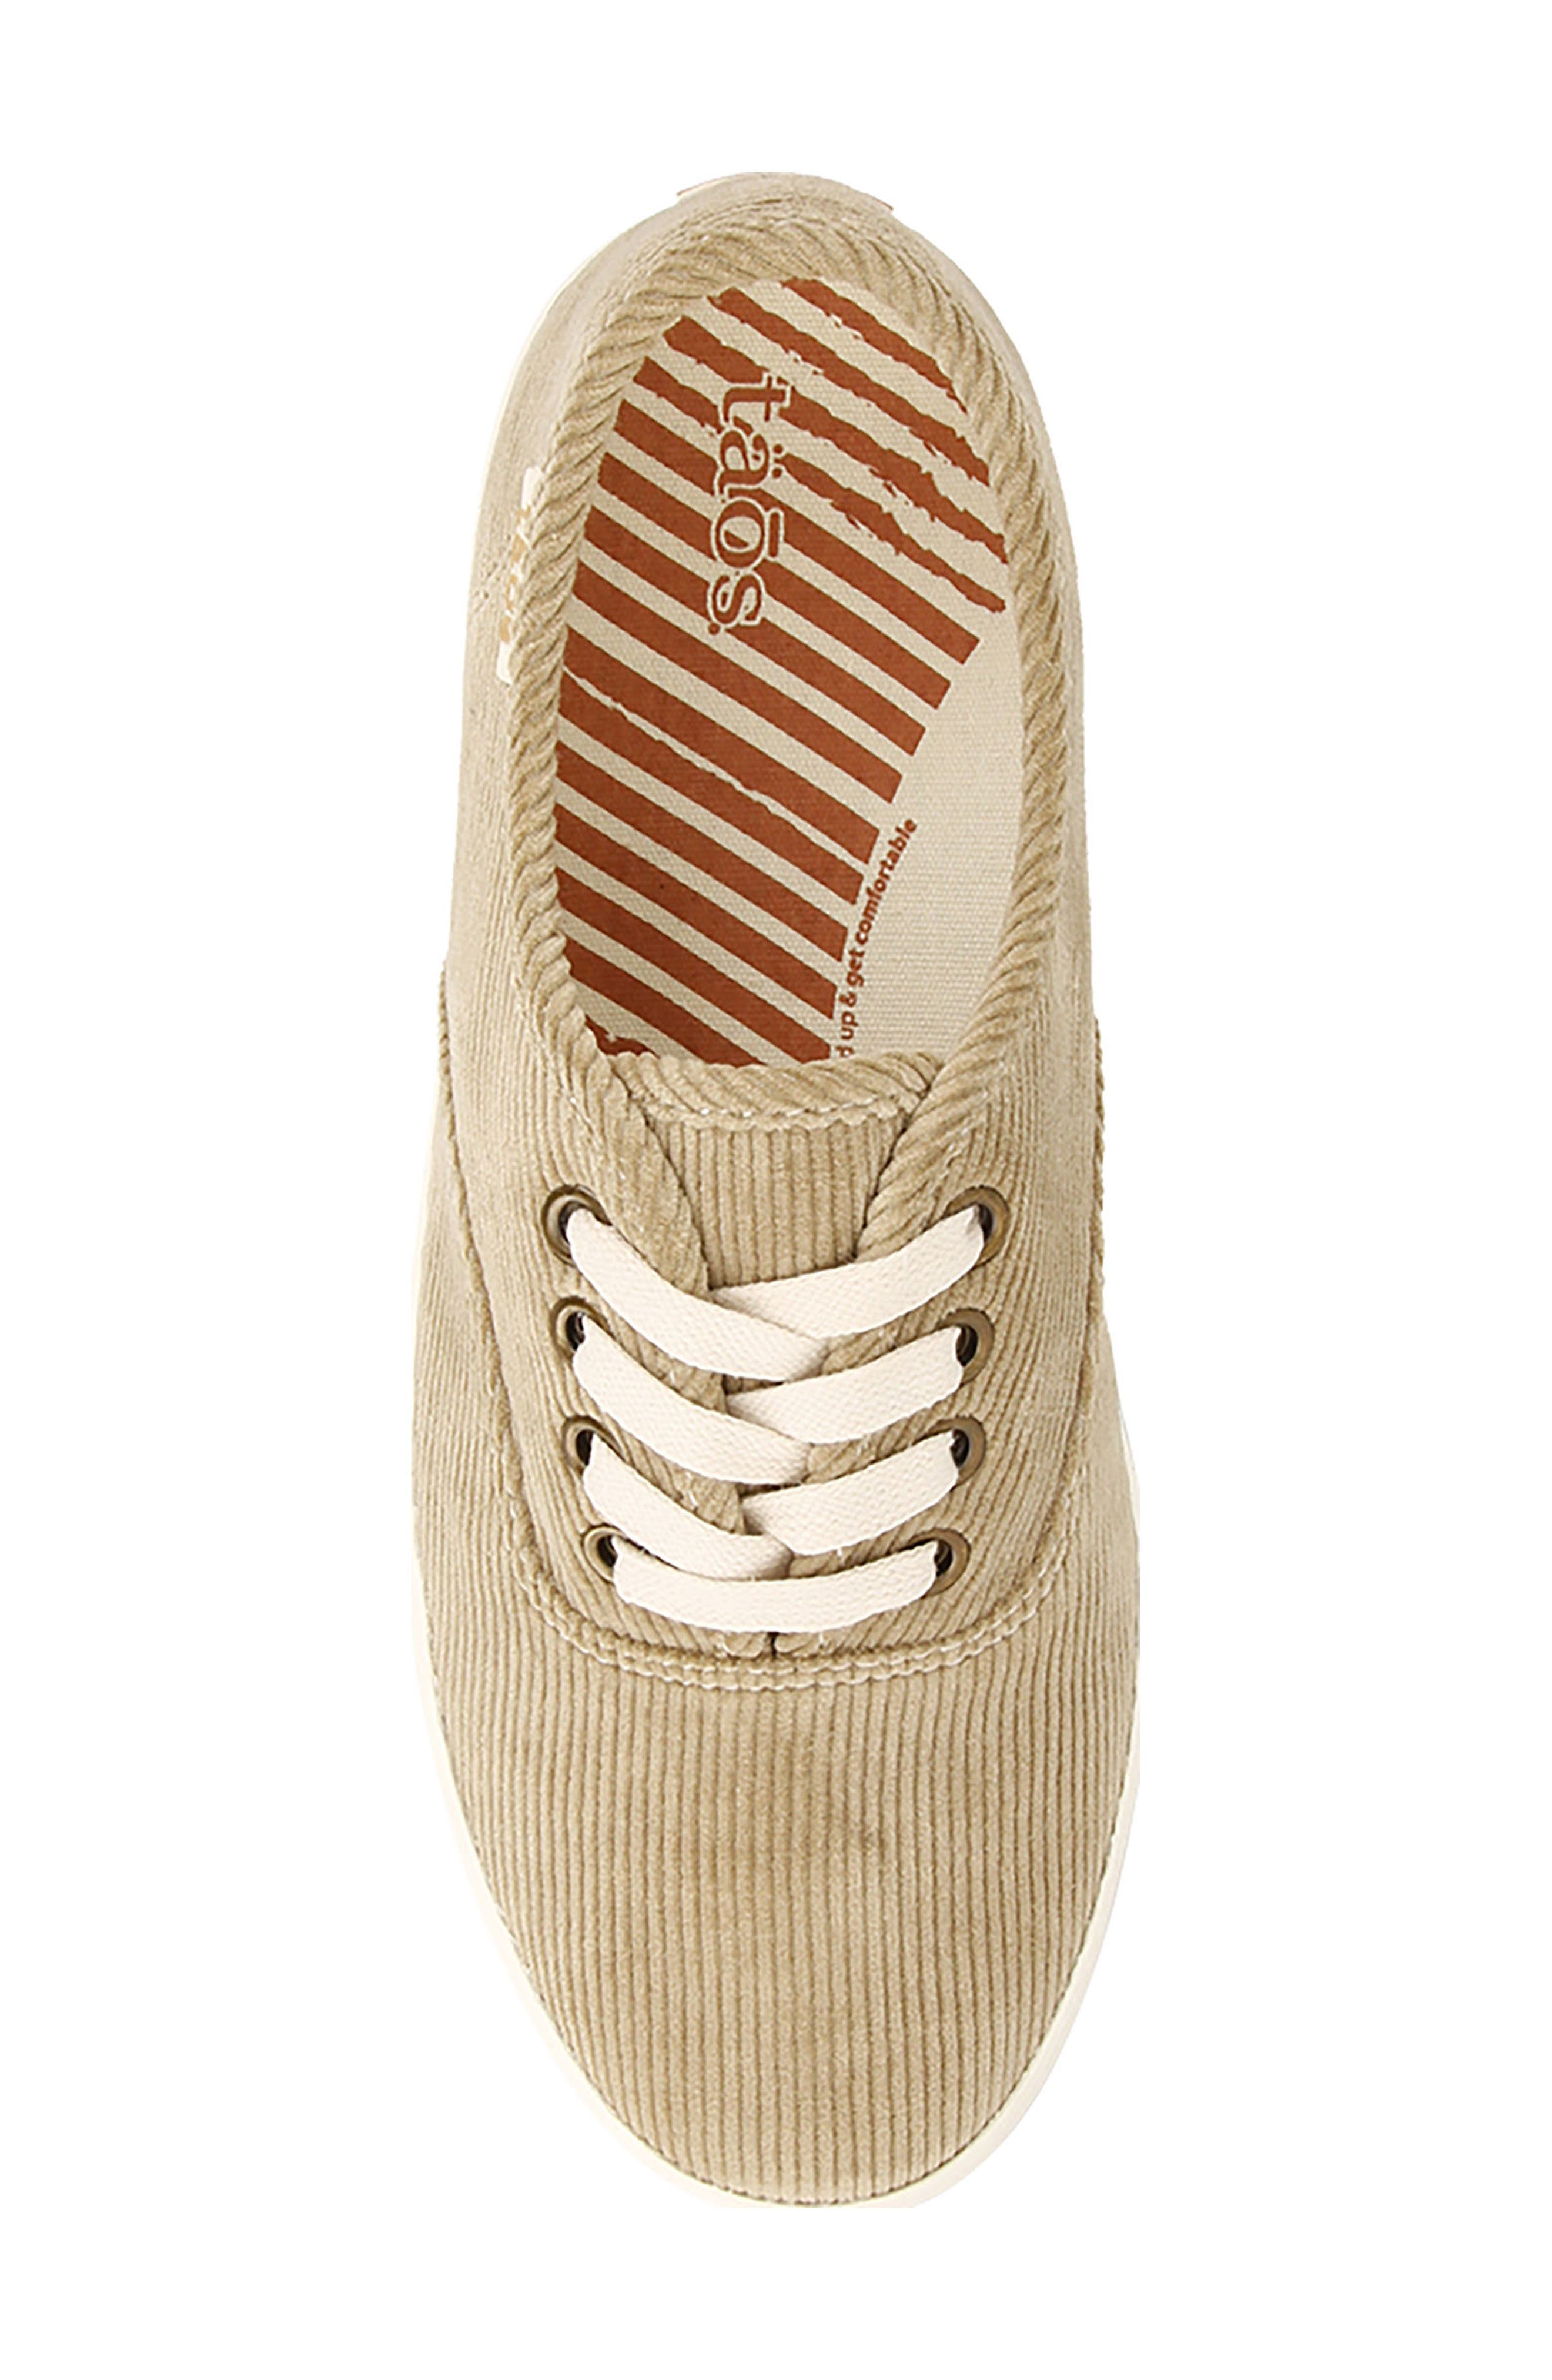 Guest Star Sneaker,                             Alternate thumbnail 4, color,                             KHAKI CORD FABRIC